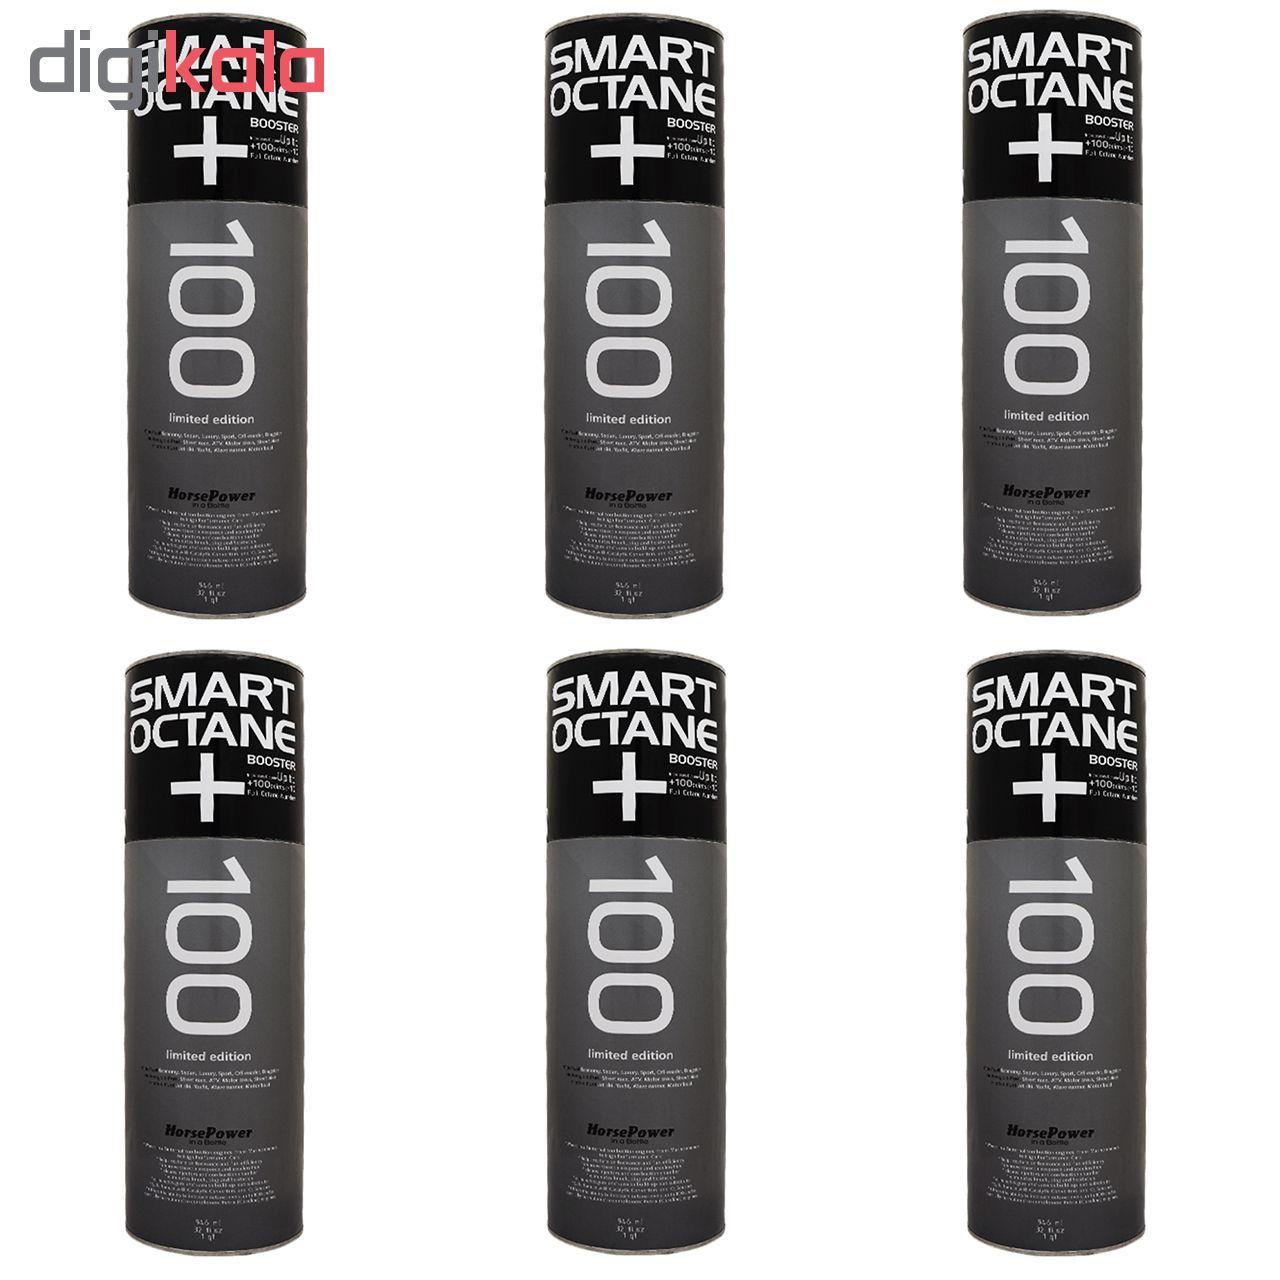 مکمل بنزین اکتان بوستر اسمارت مدل Smart Octane Booster 100013 حجم 1 لیتر بسته 6 عددی main 1 1